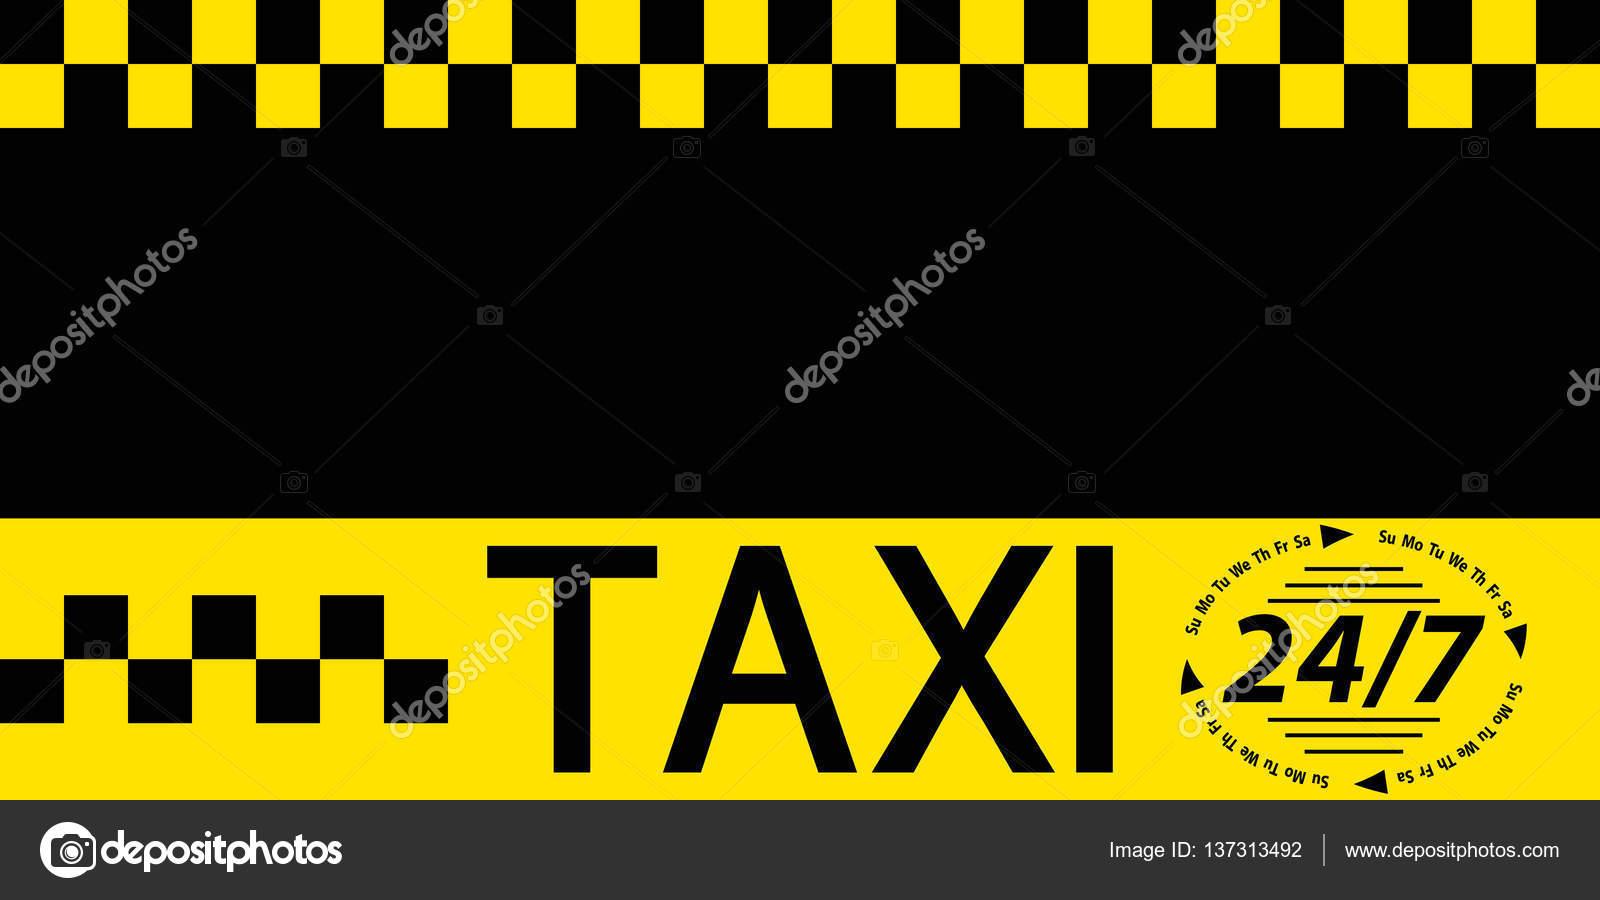 Business card taxi banner — Stock Vector © koksikoks #137313492